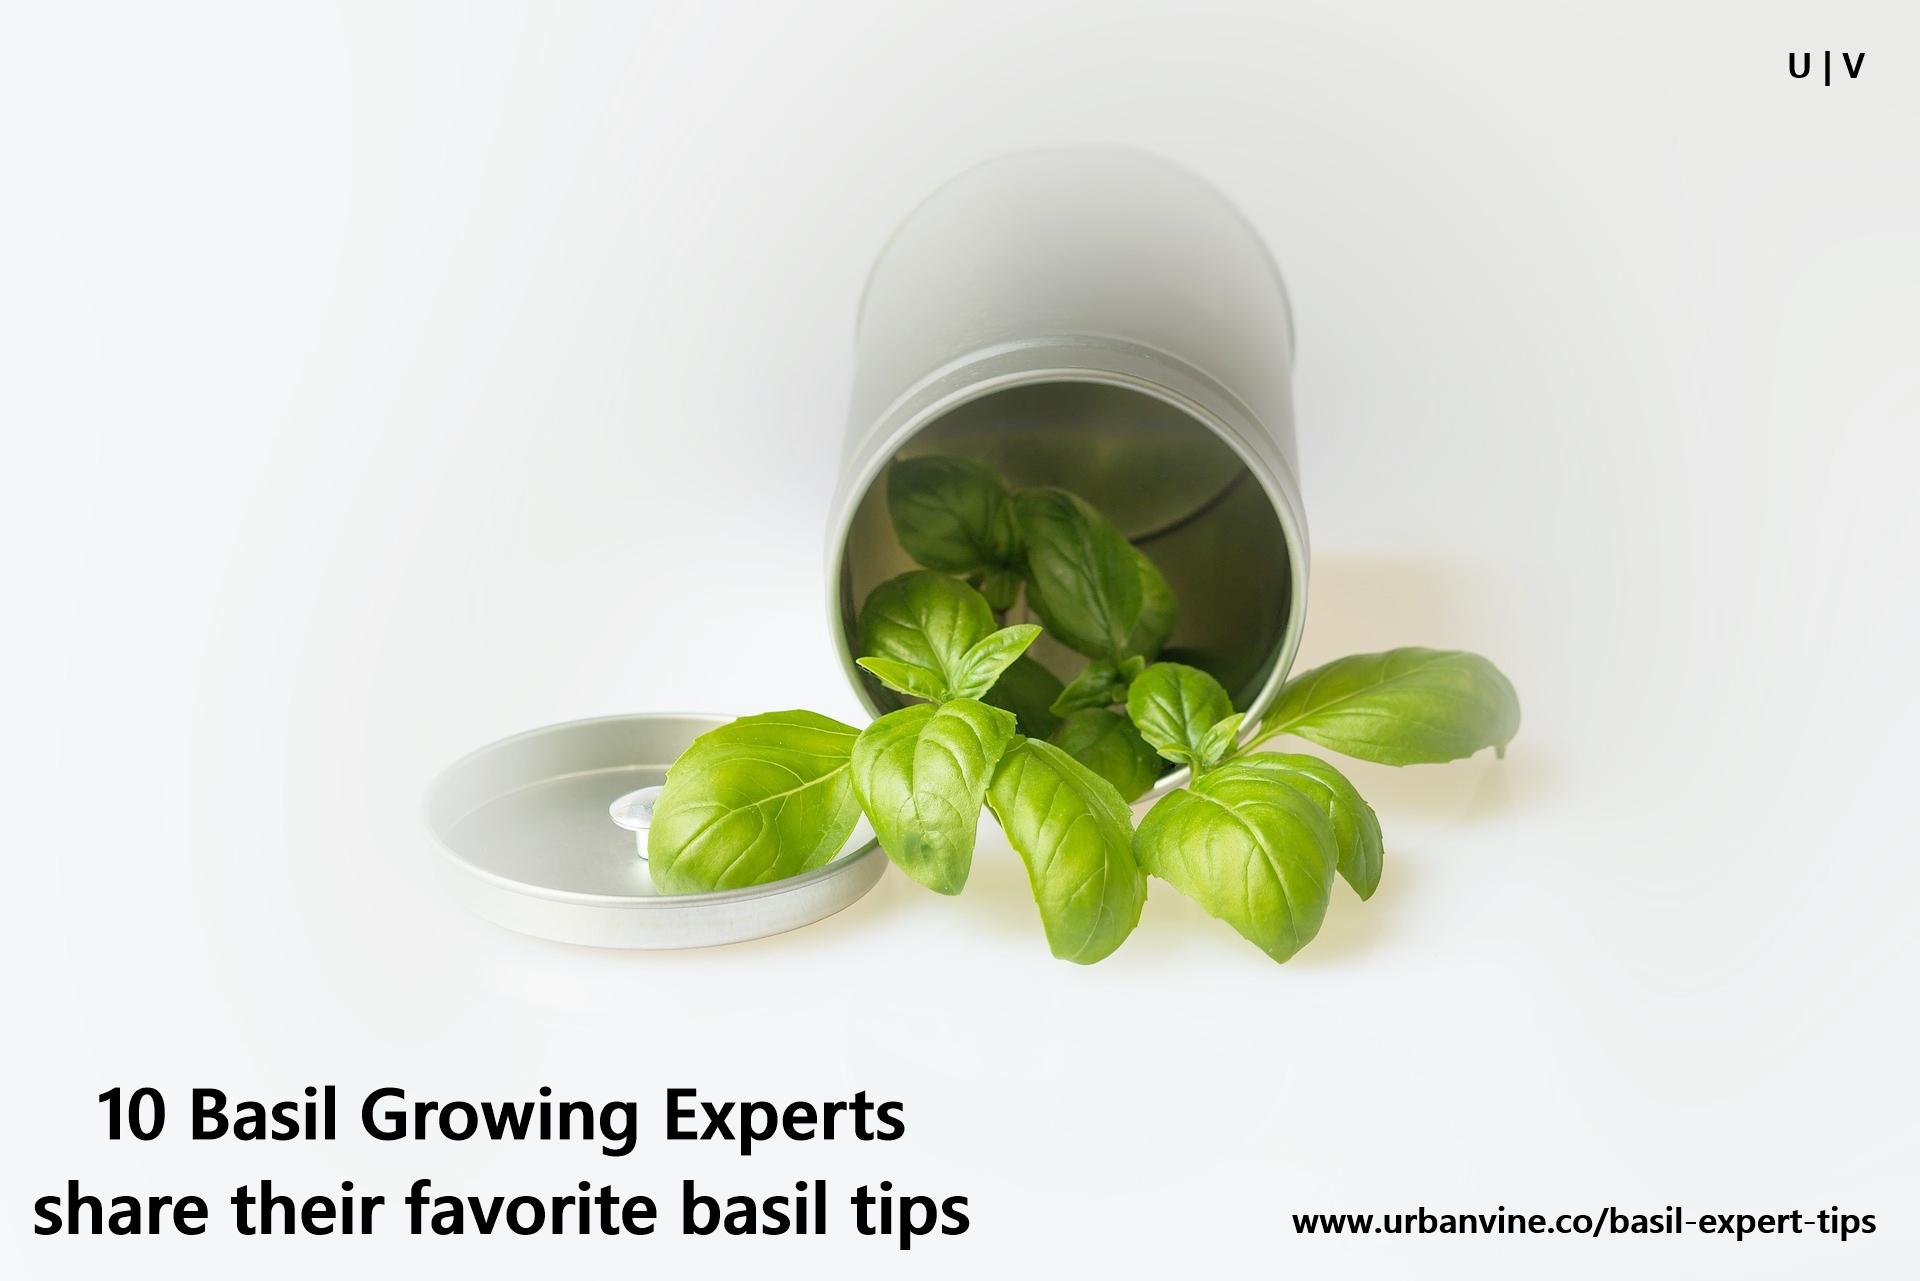 10 Basil Growing Experts share tips to grow better basil